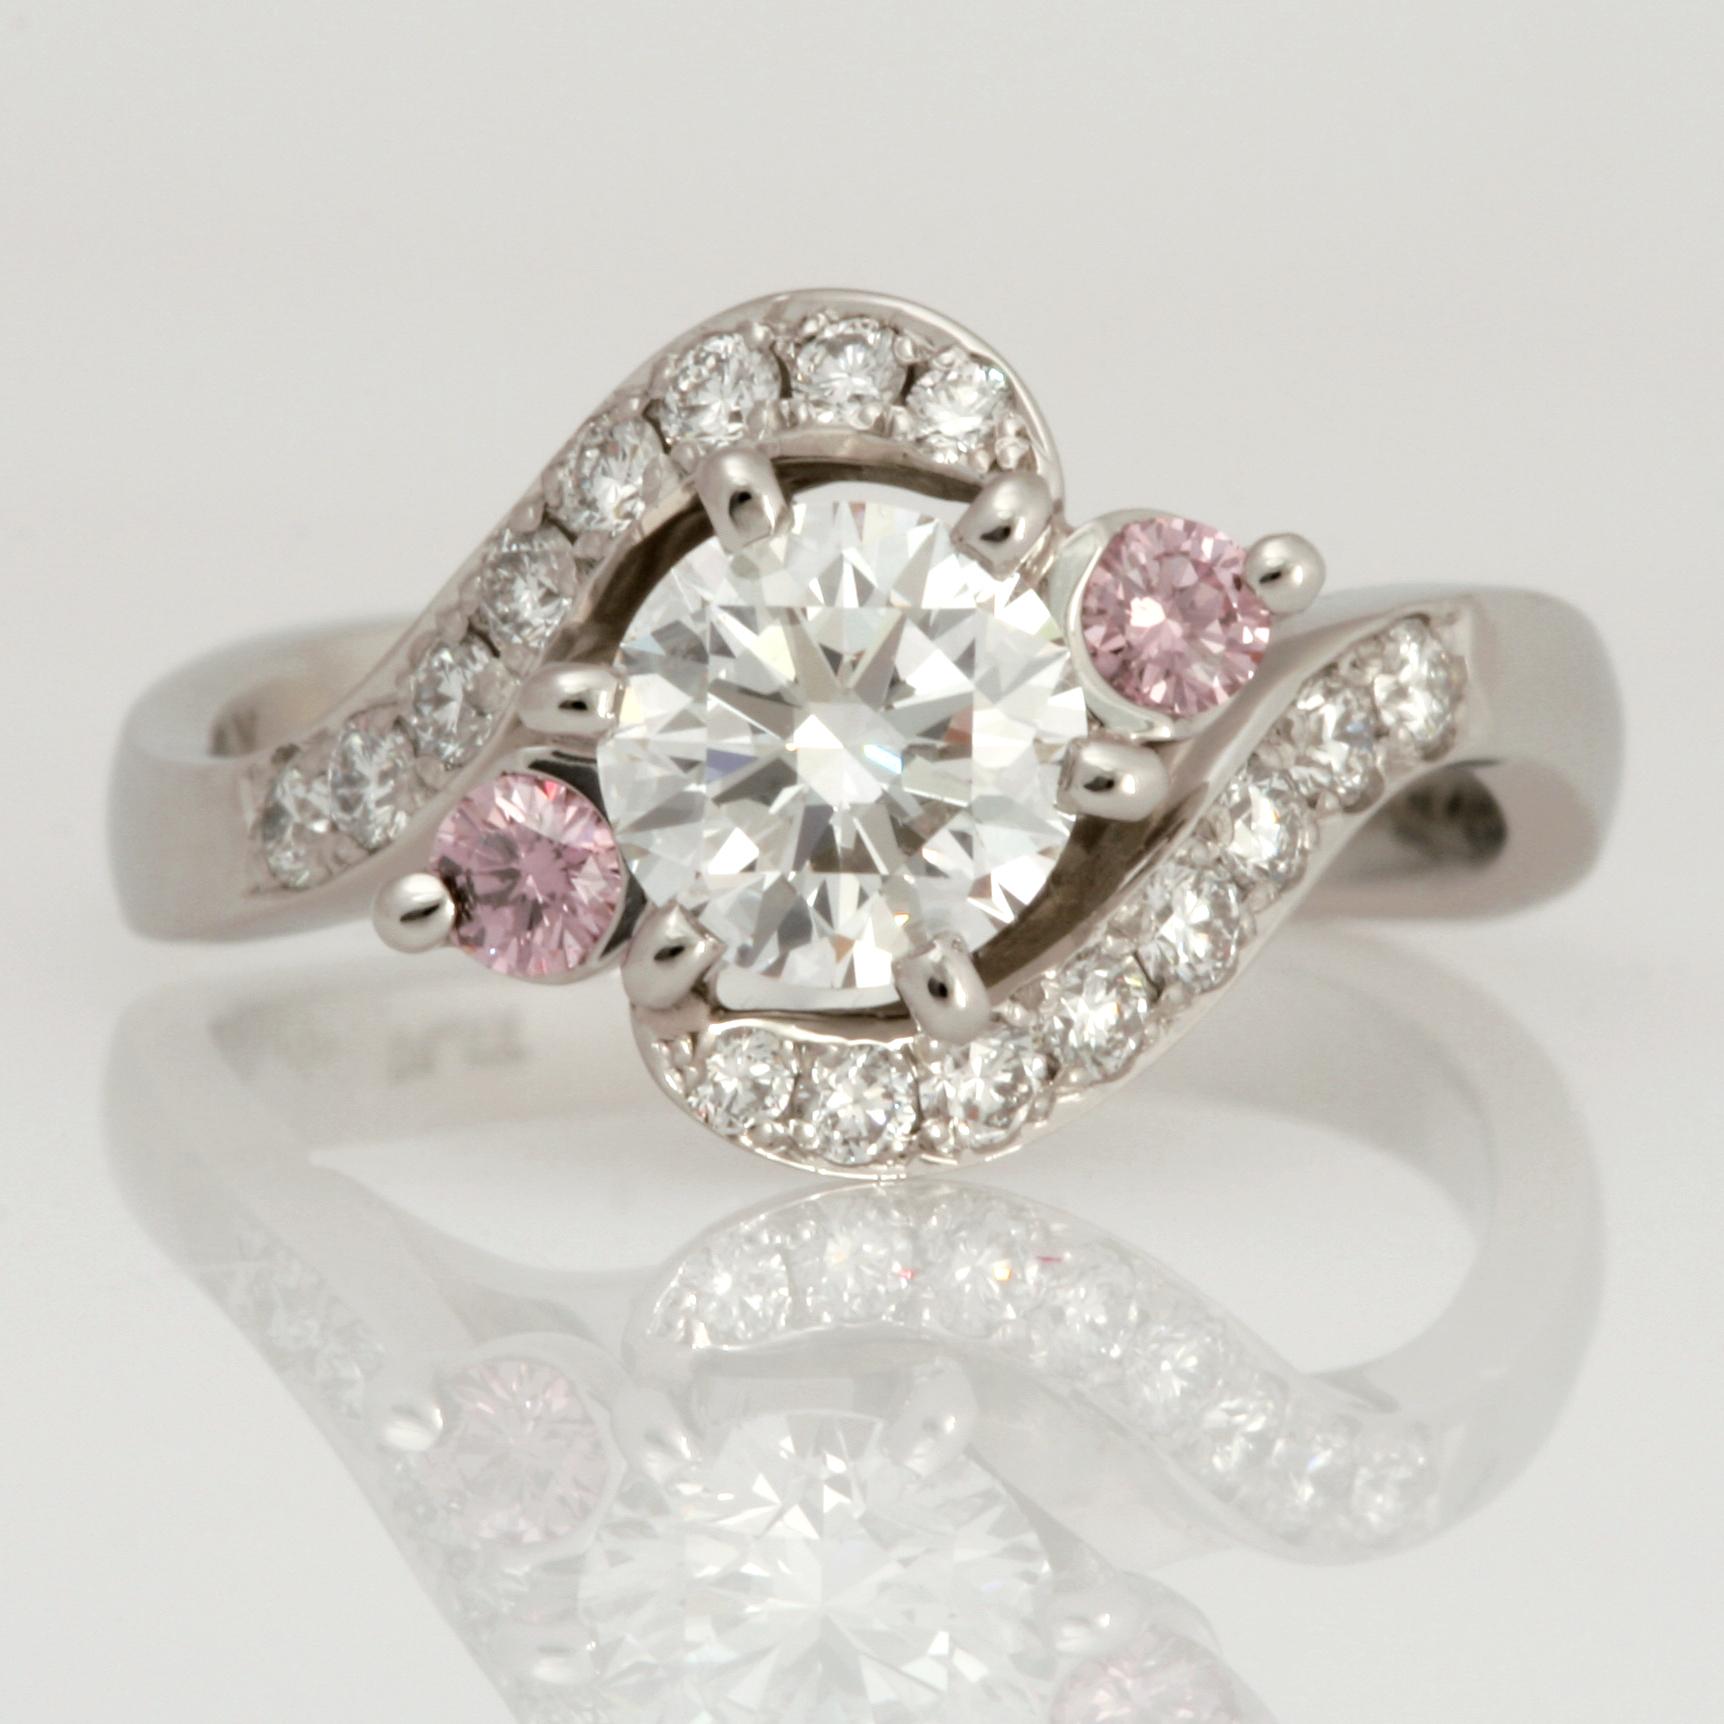 Handmade ladies platinum diamond engagement ring featuring pink and white diamonds.